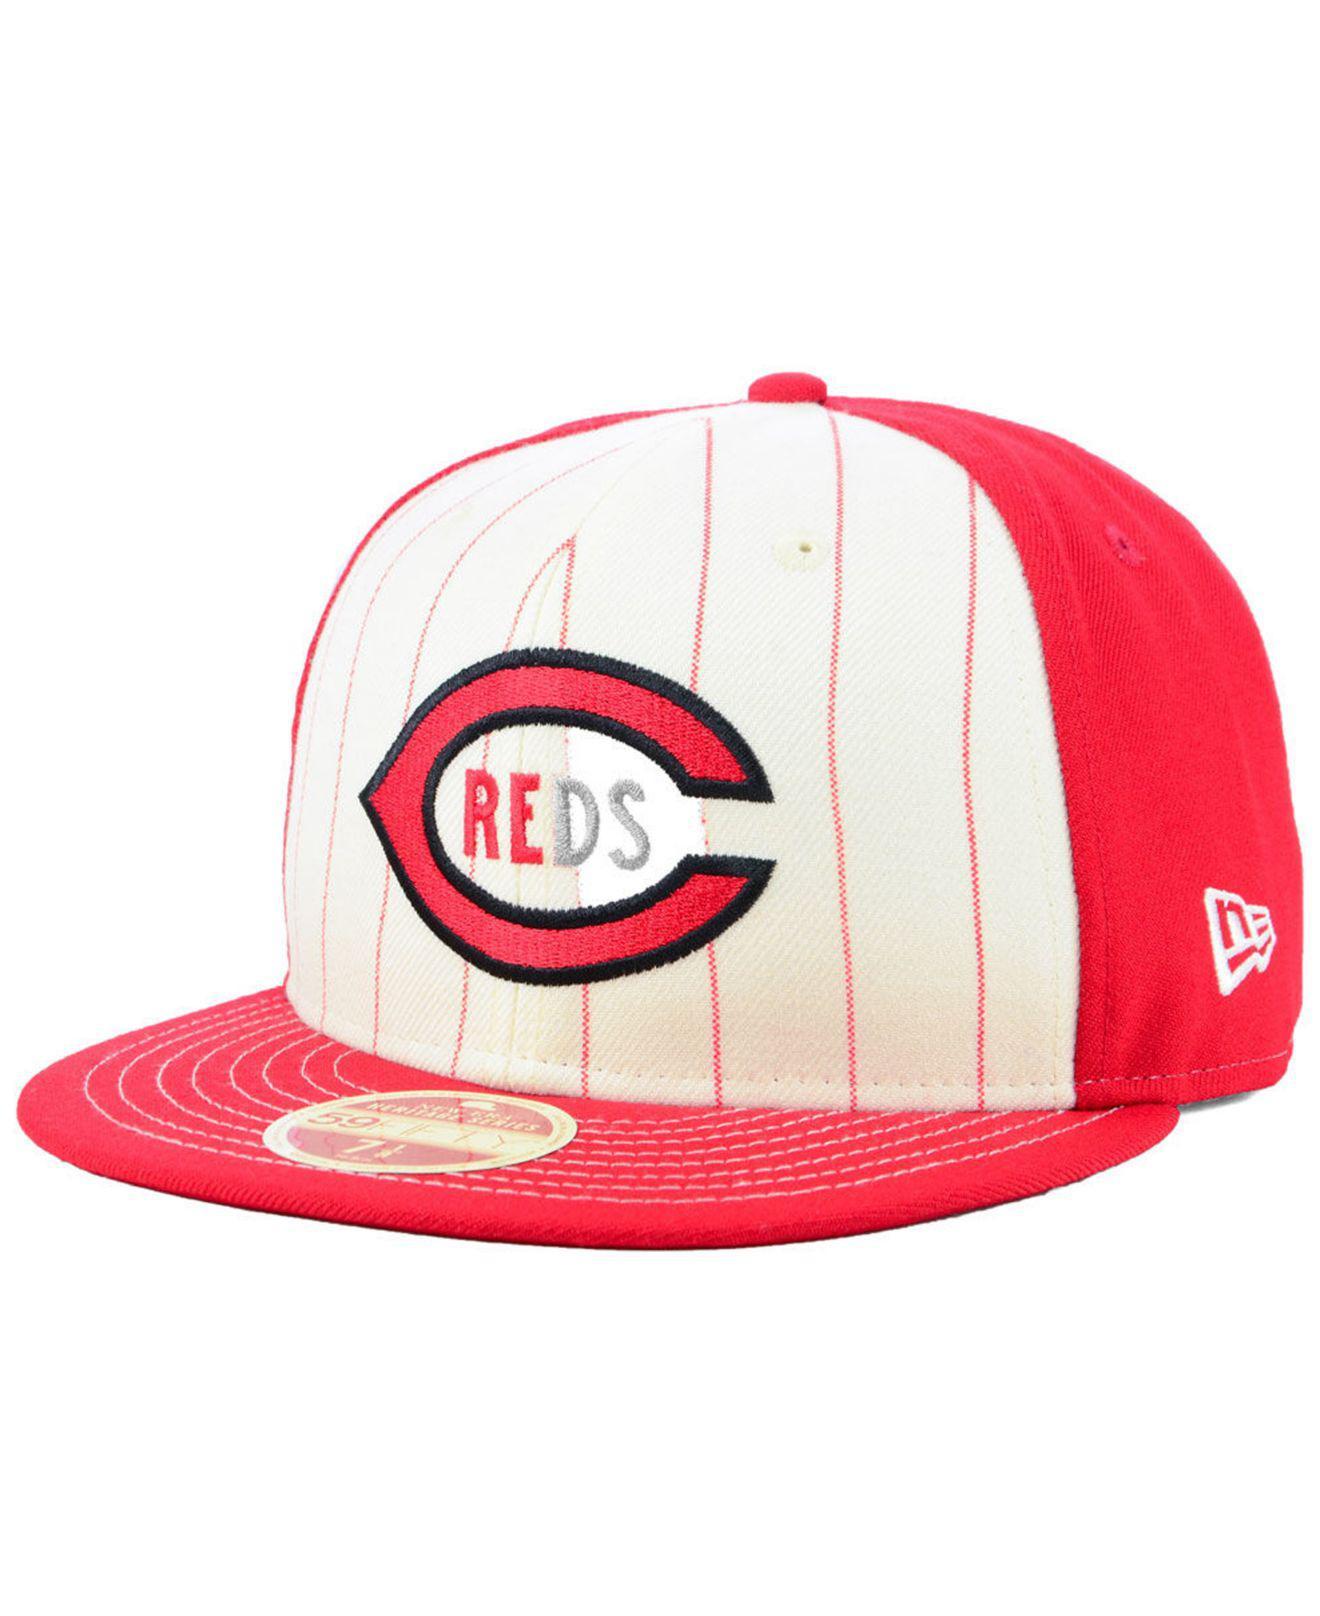 lowest price c1130 6ec29 usa ktz. mens cincinnati reds vintage front 59fifty fitted cap 349d3 f29cb